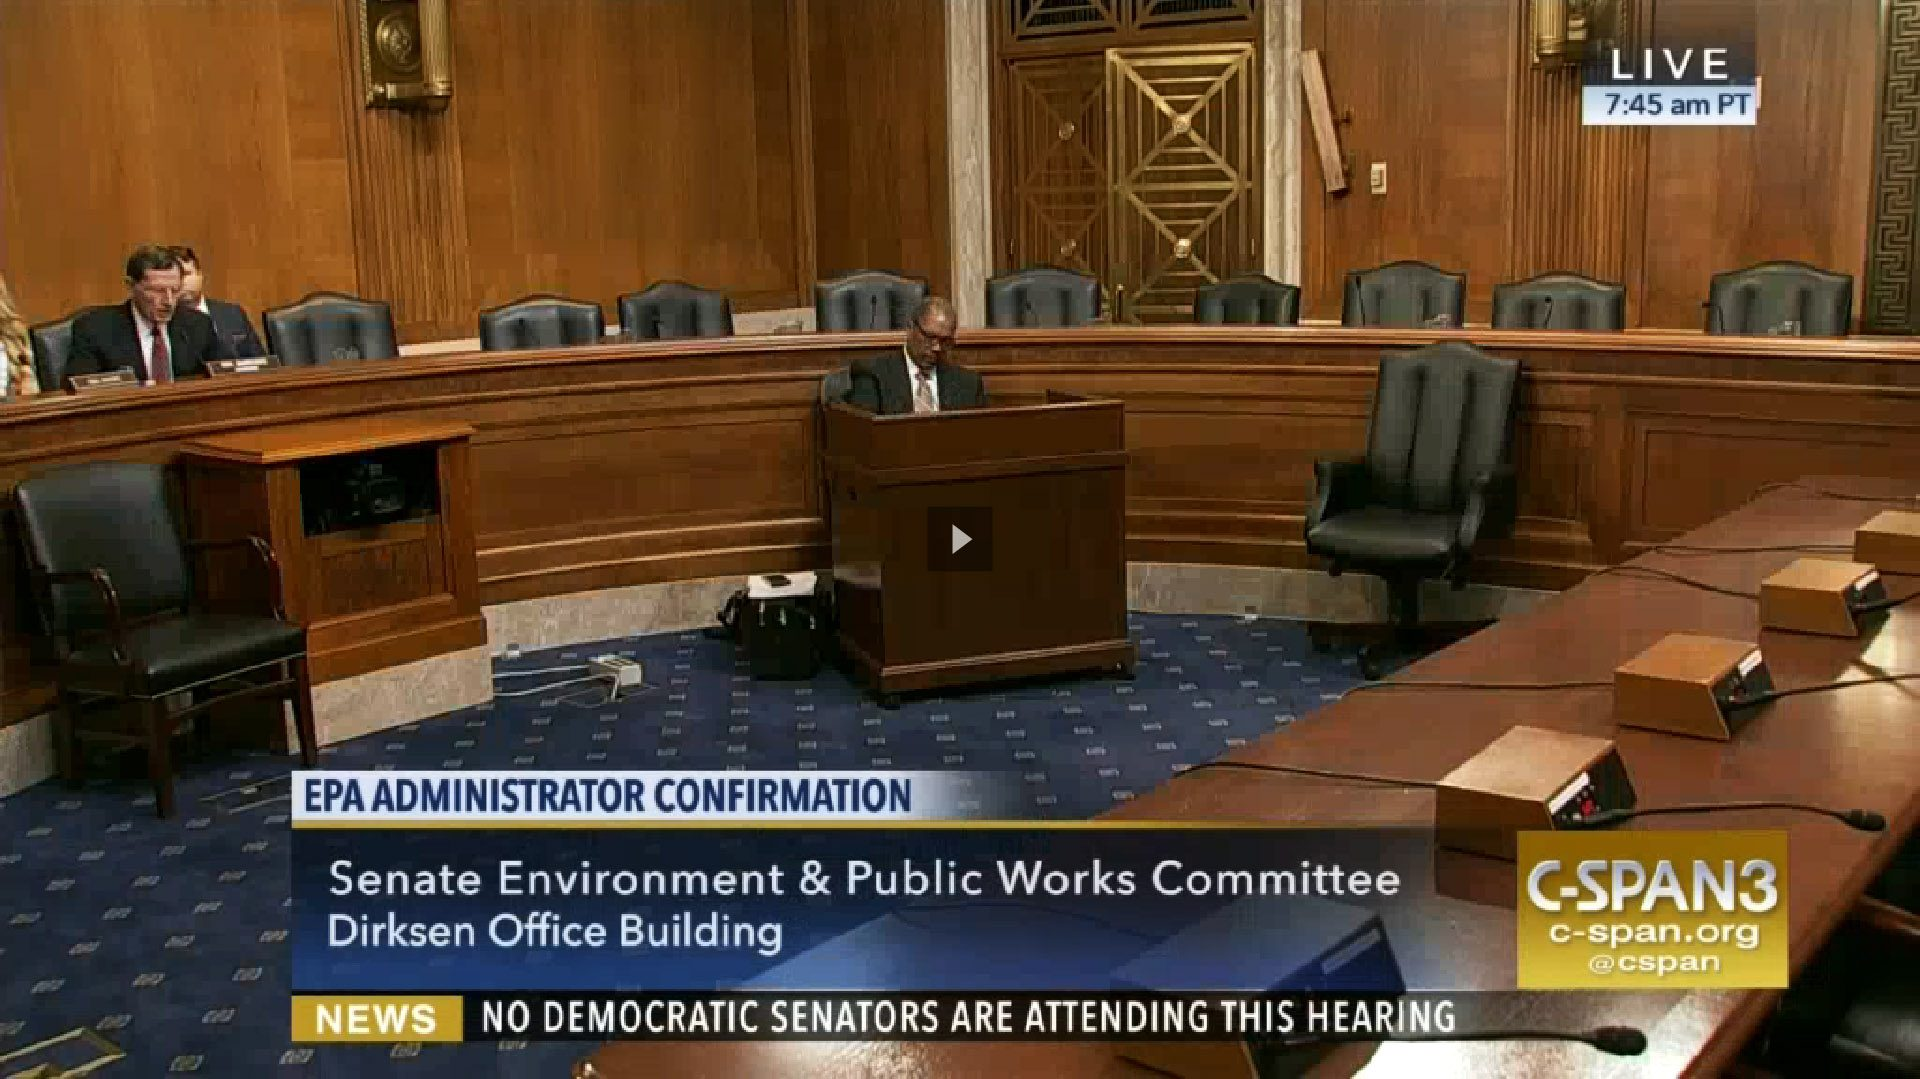 Republicans Outmaneuver Democratic Boycott to Allow Senate